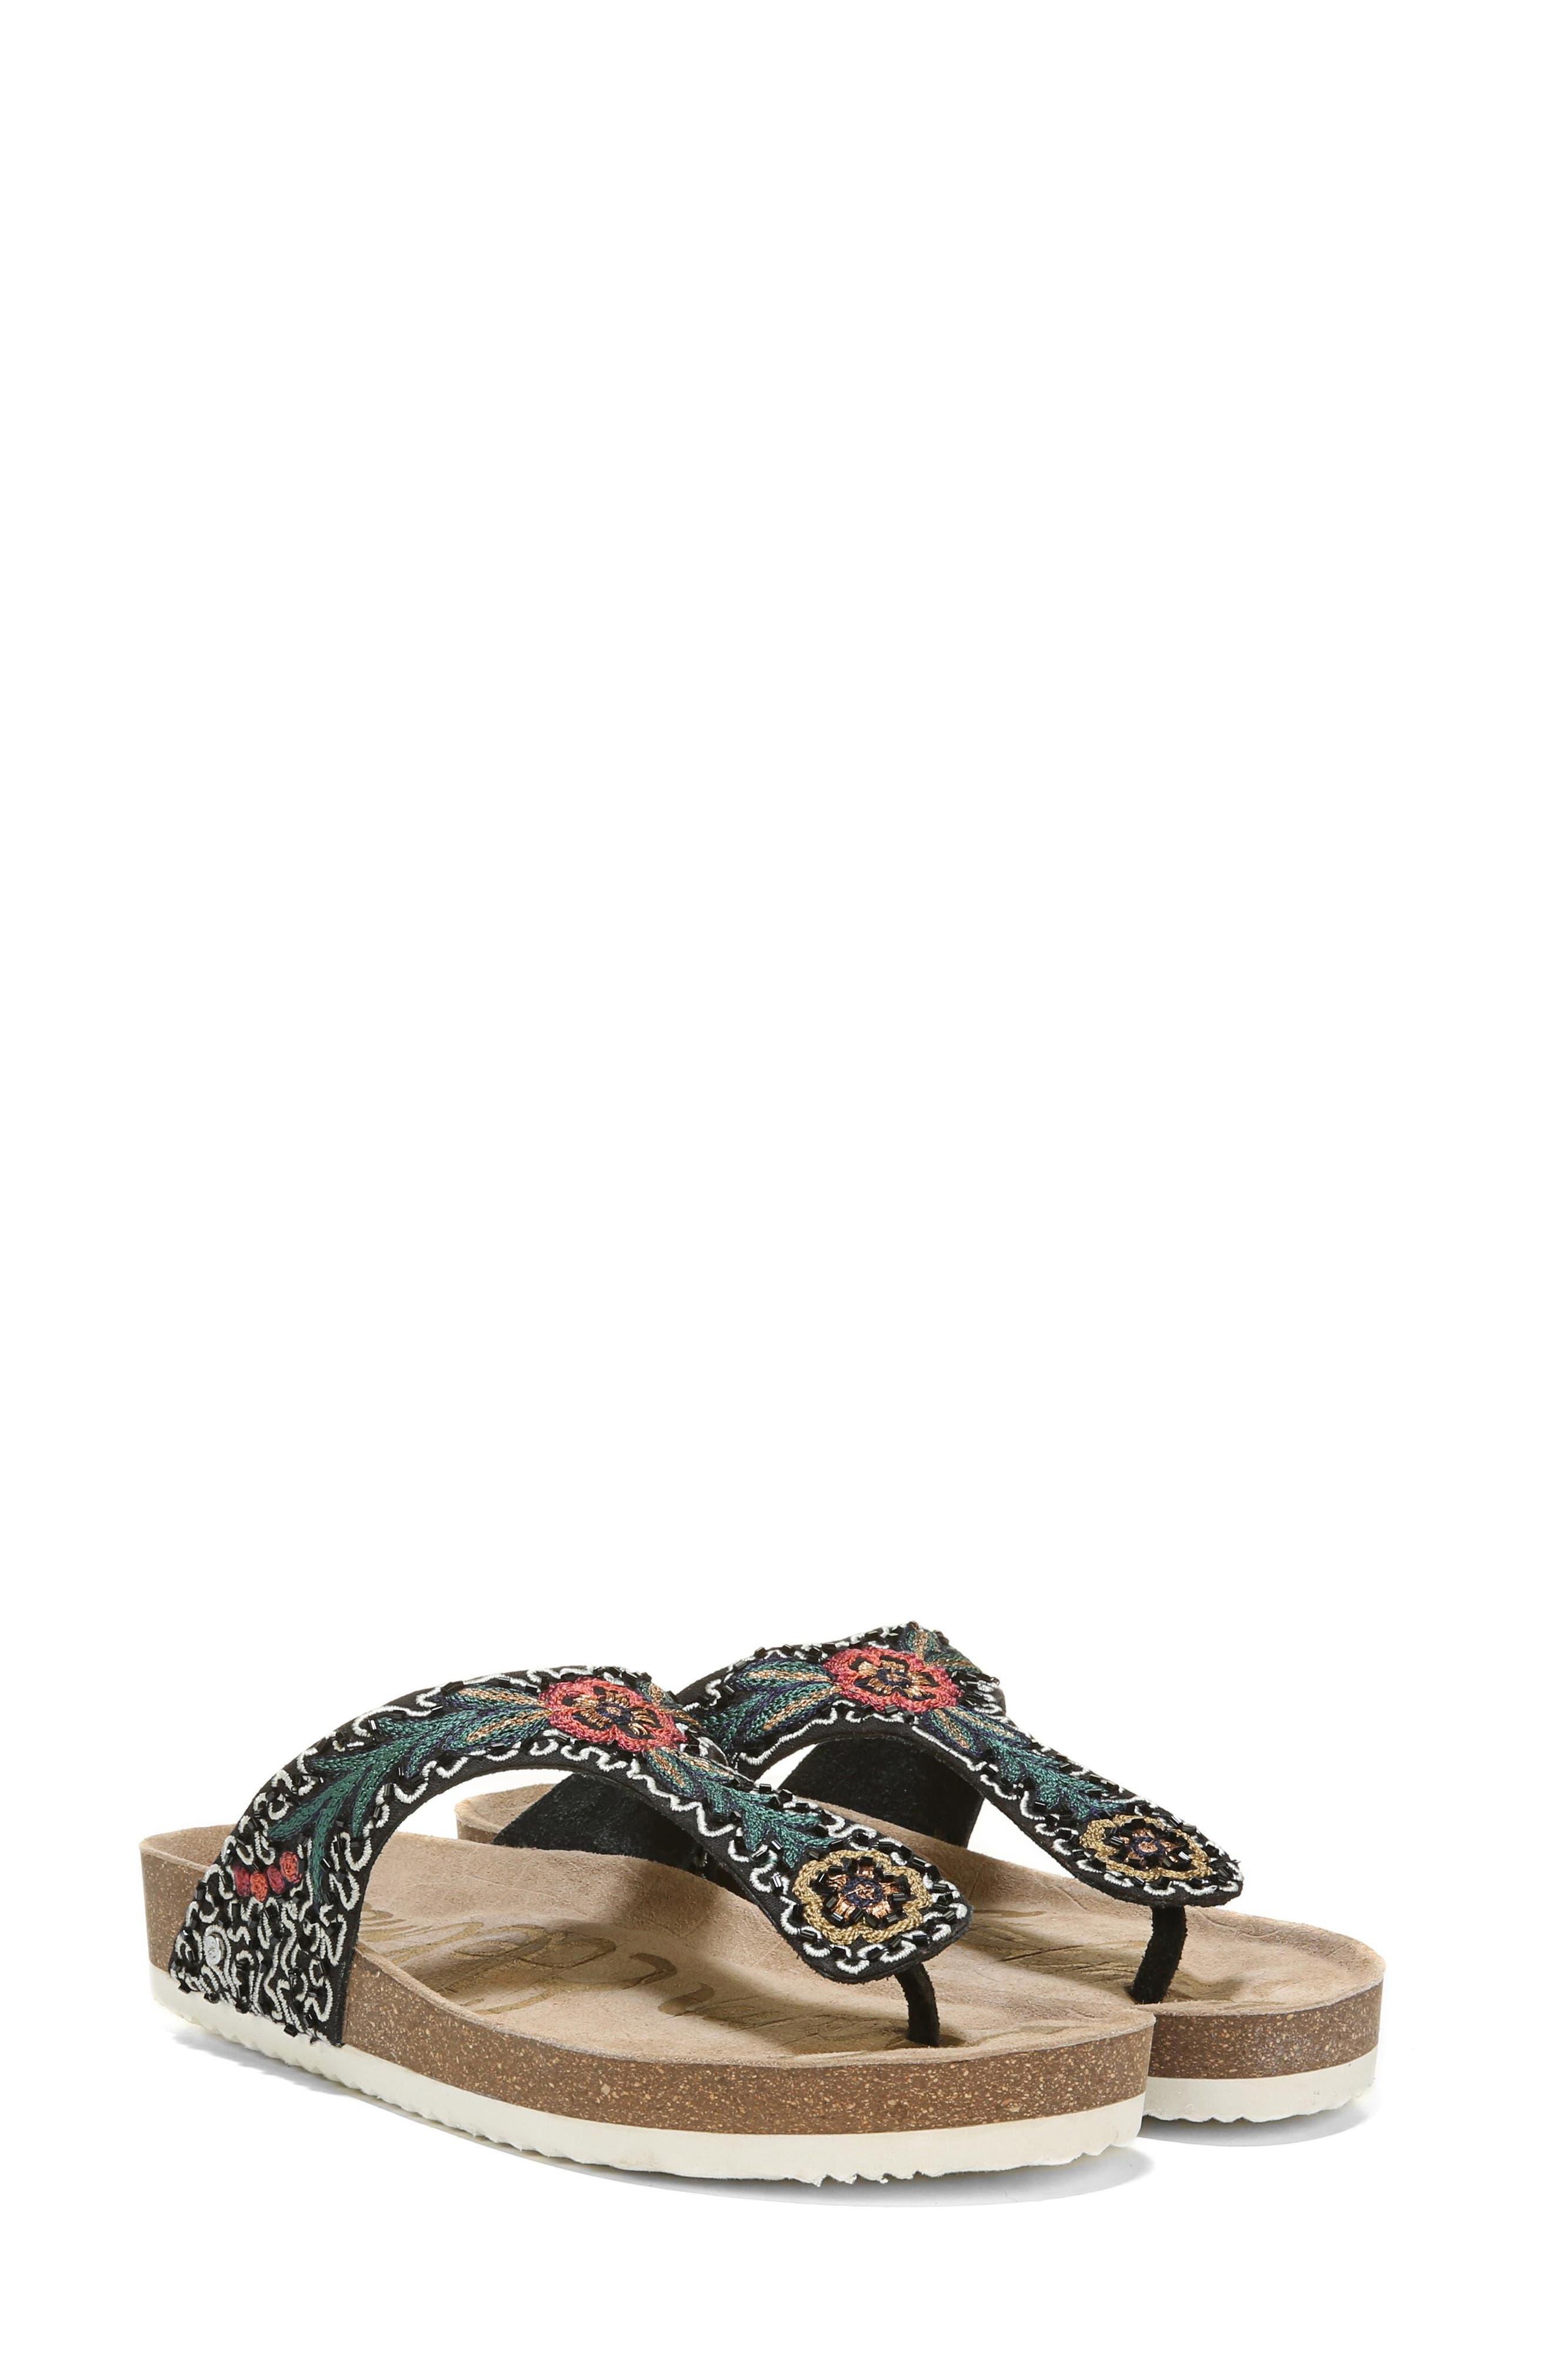 Olivie Beaded Flip Flop,                         Main,                         color, Black Multi